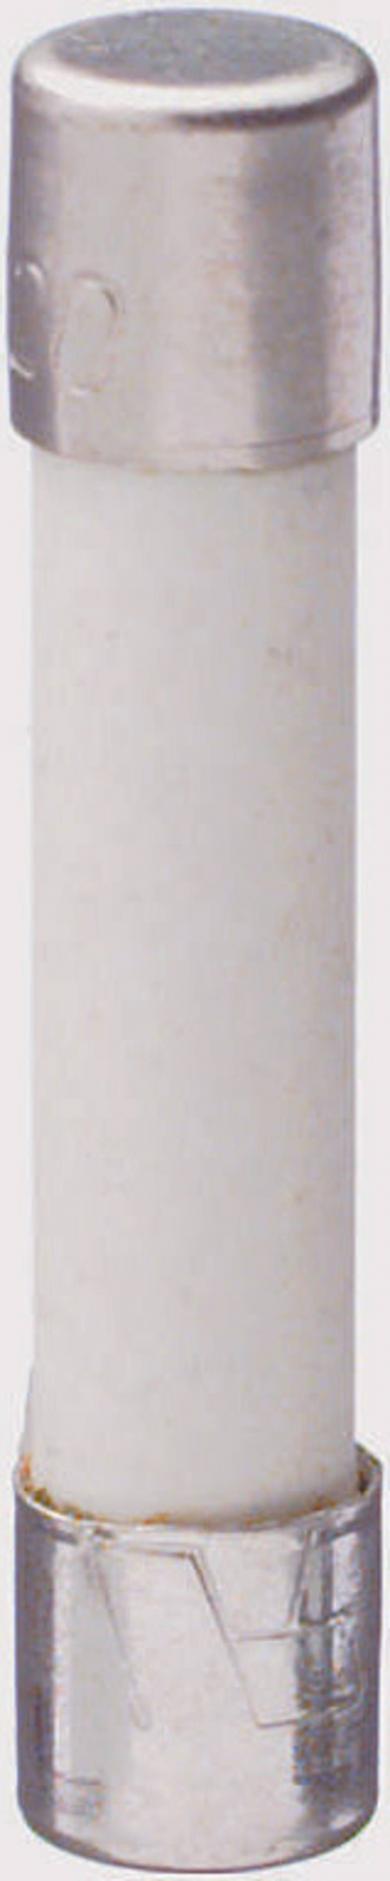 Siguranţă 6,4 x 31,8 mm ultrarapidă -FF- Eska tip GBB, 250 V/AC, 125 V/DC, 4 A